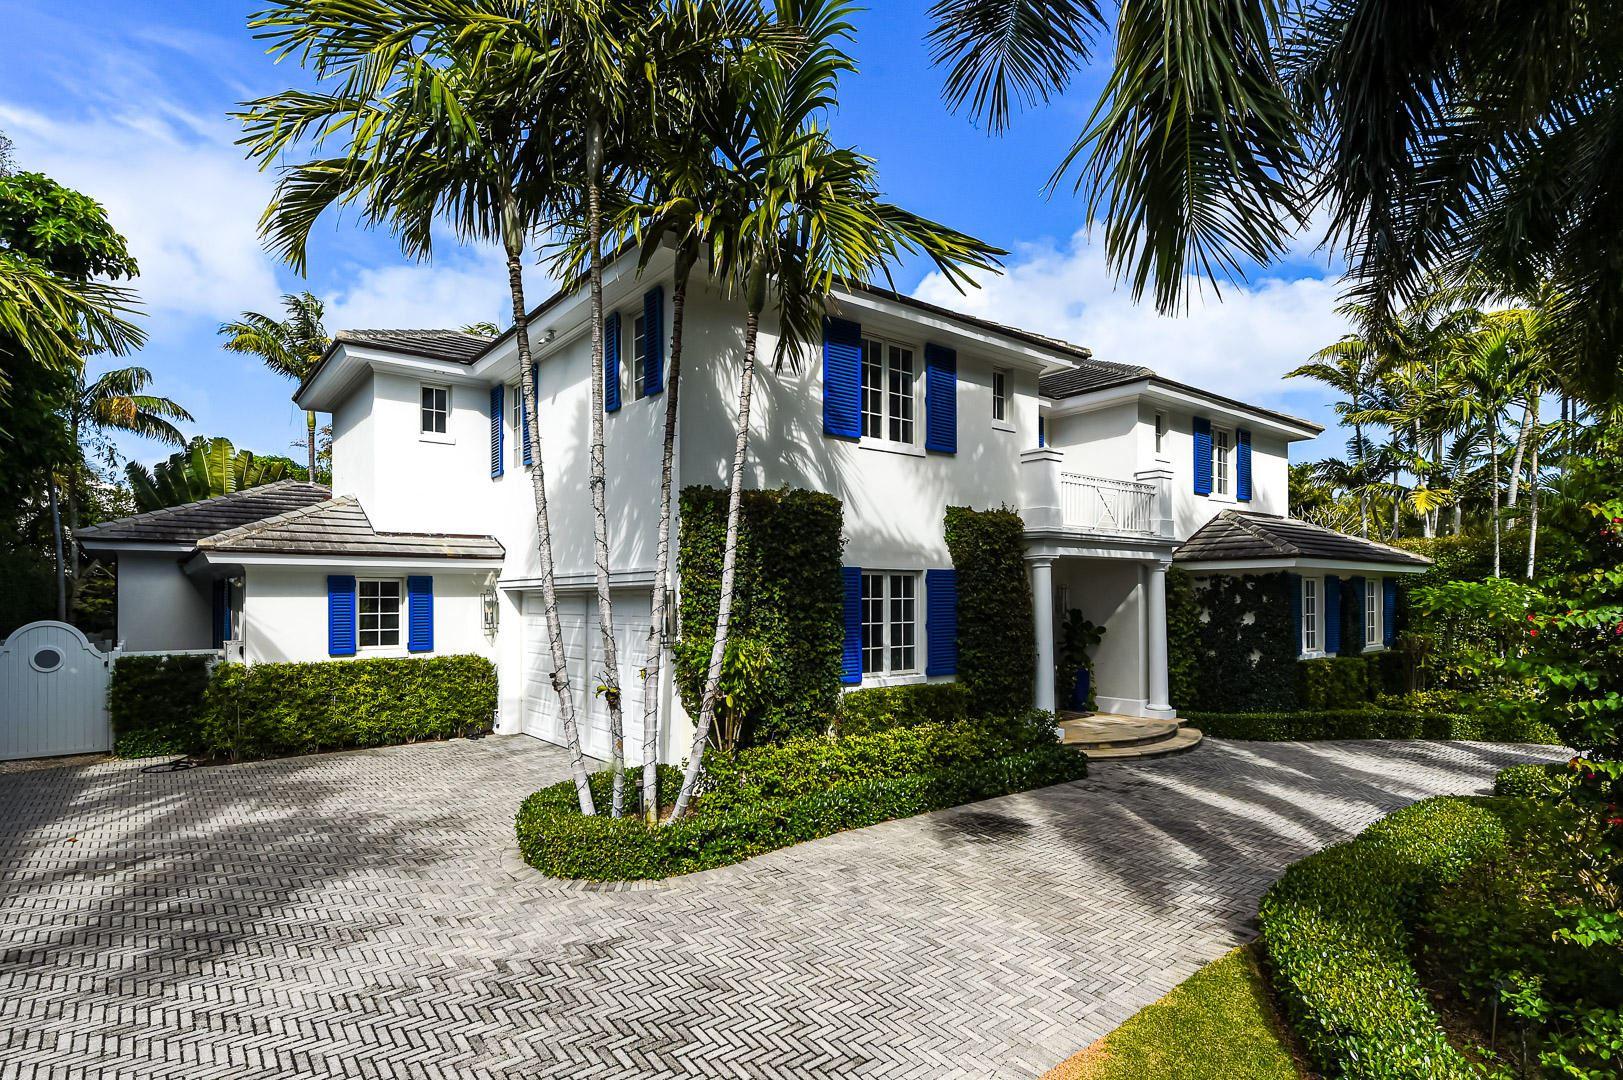 271 La Puerta Way, Palm Beach, FL 33480 - #: RX-10598518